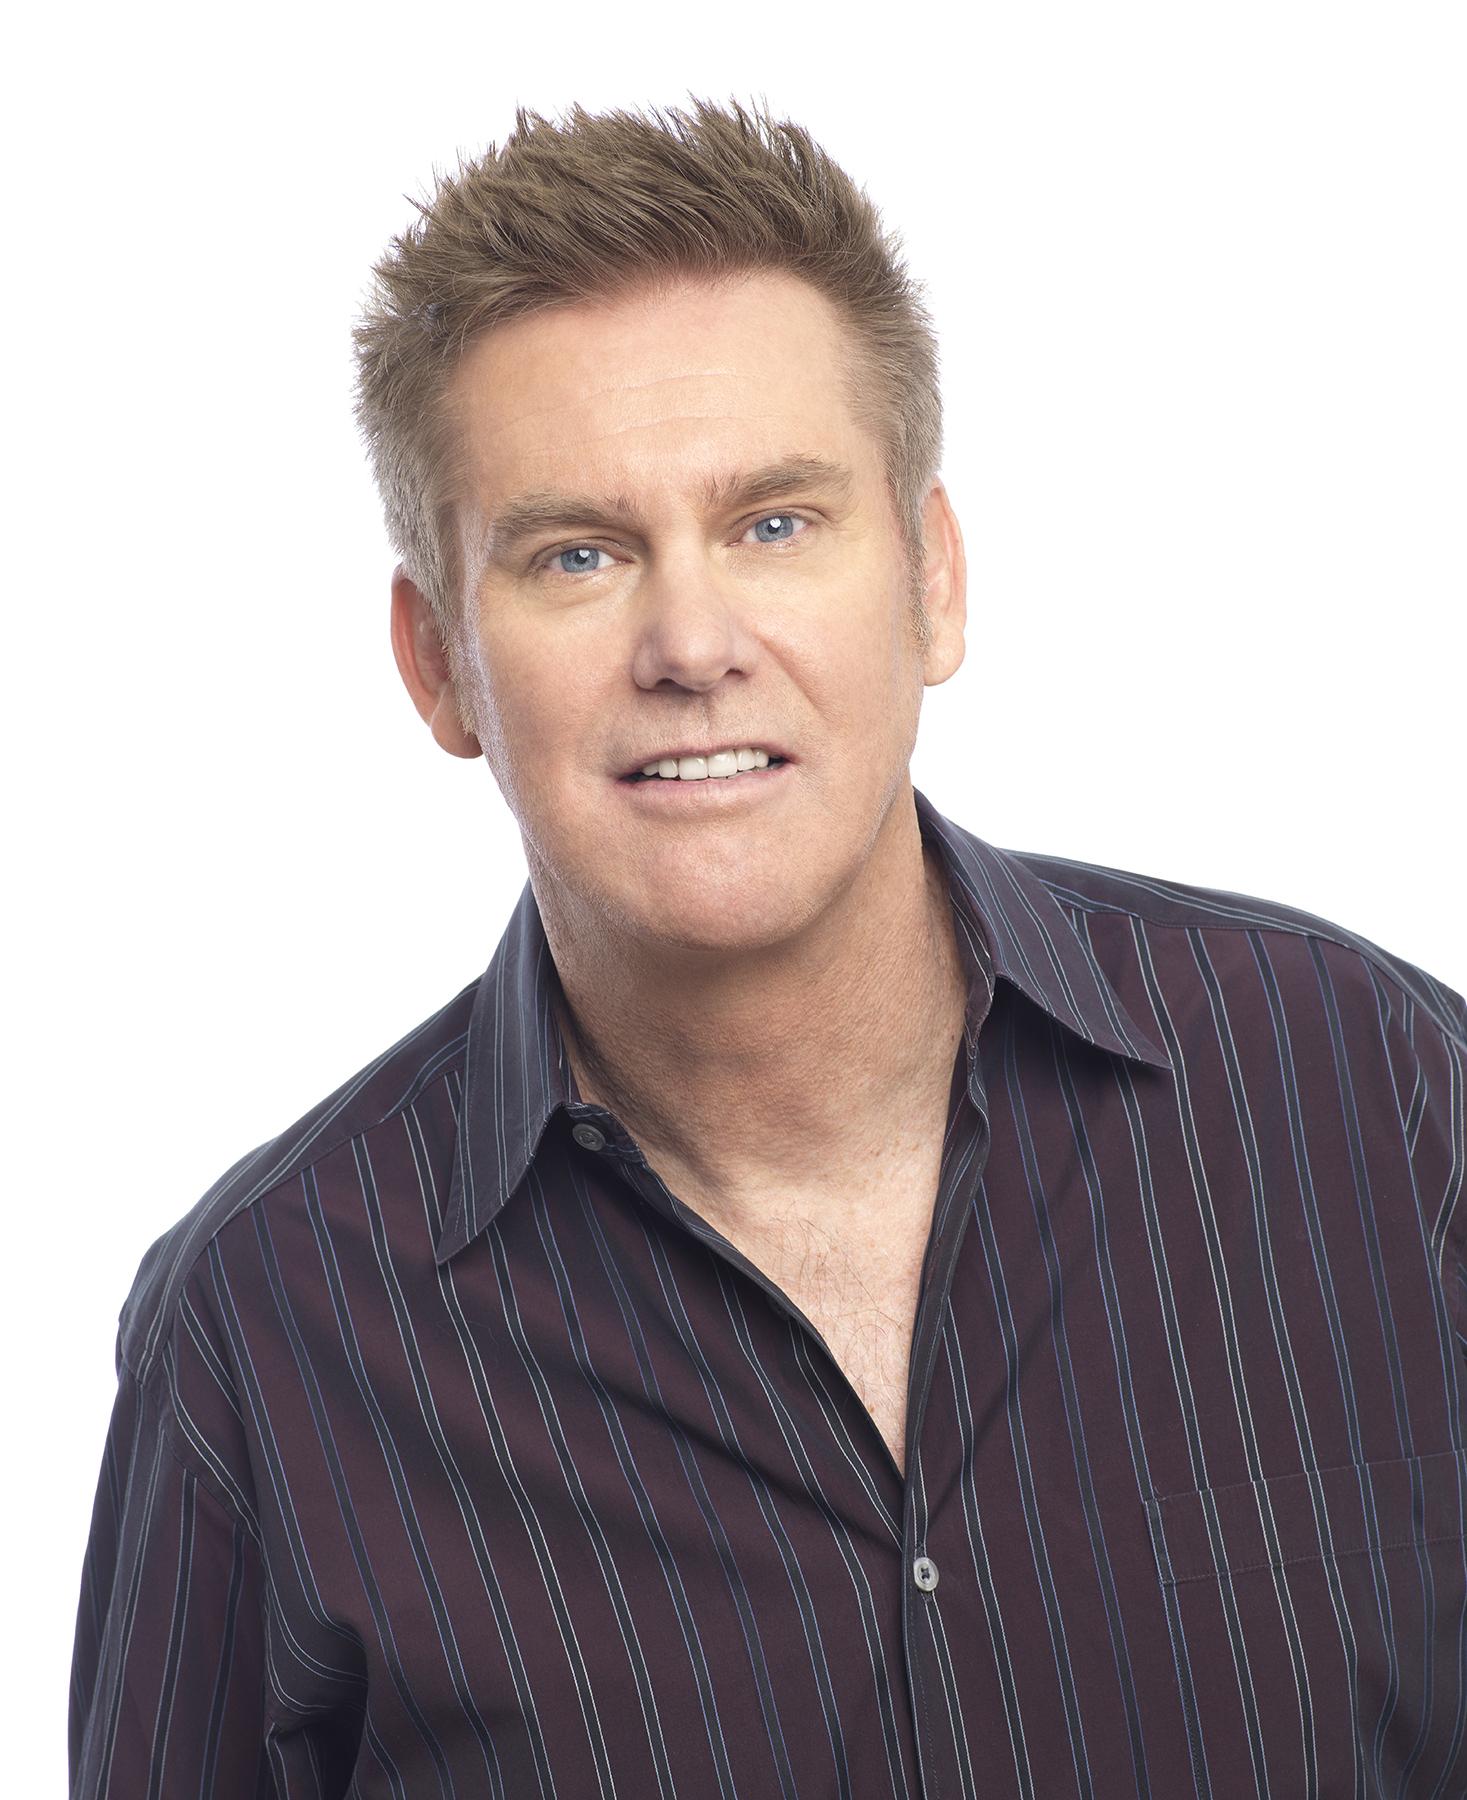 Brian Regan headshot.sm.jpg